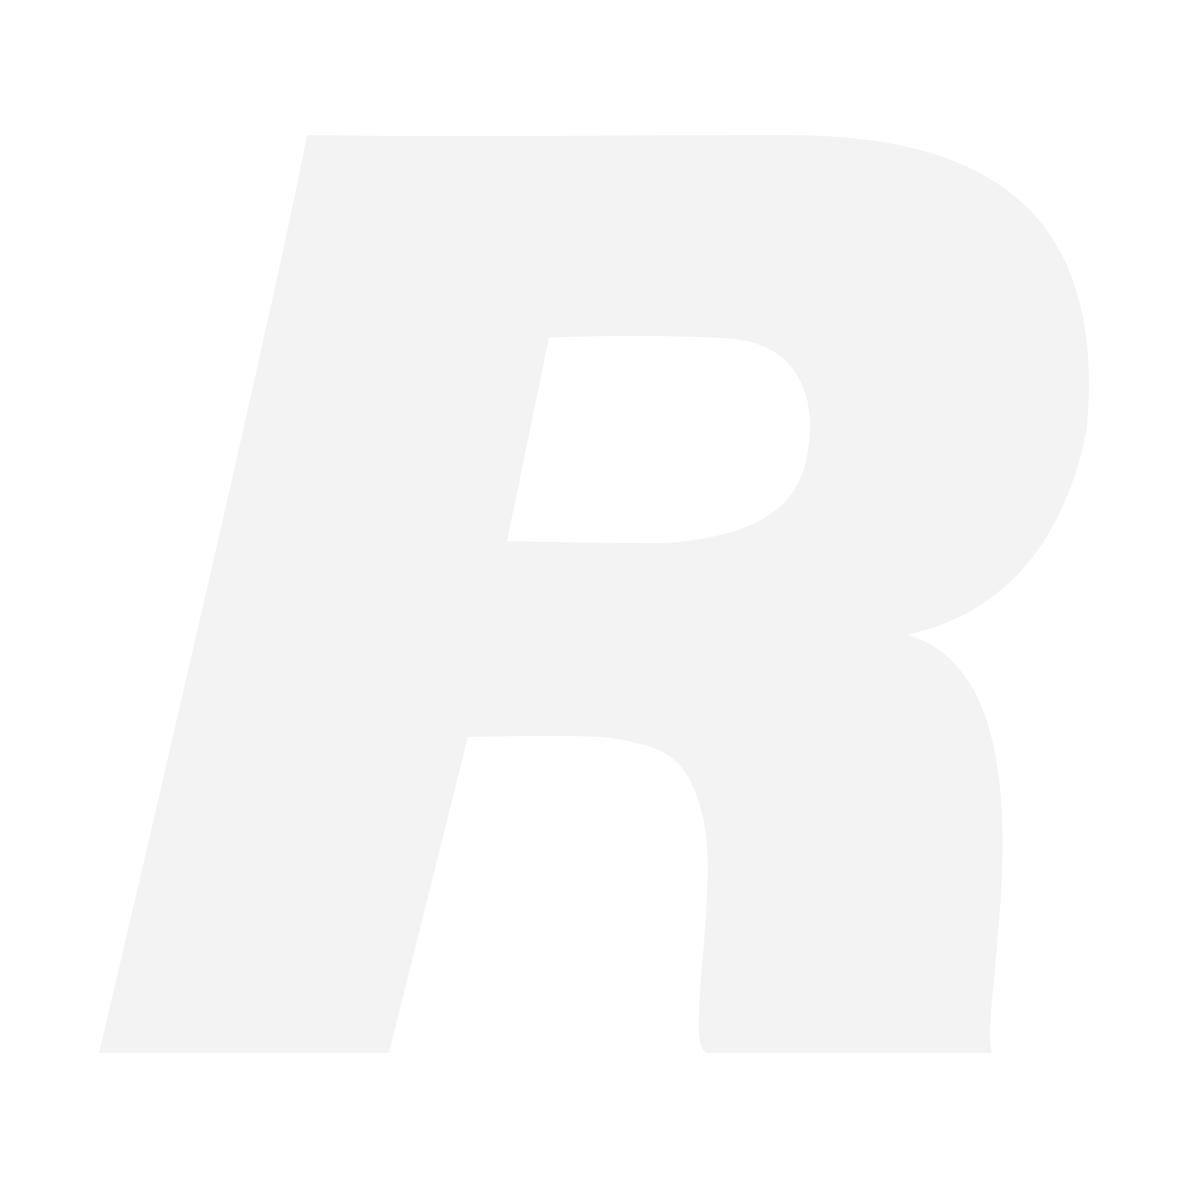 TAMRON SAL AF 18-200/3.5-6.3 IF MACRO XR DI II KÄYTETTY (SONY A-MOUNT)